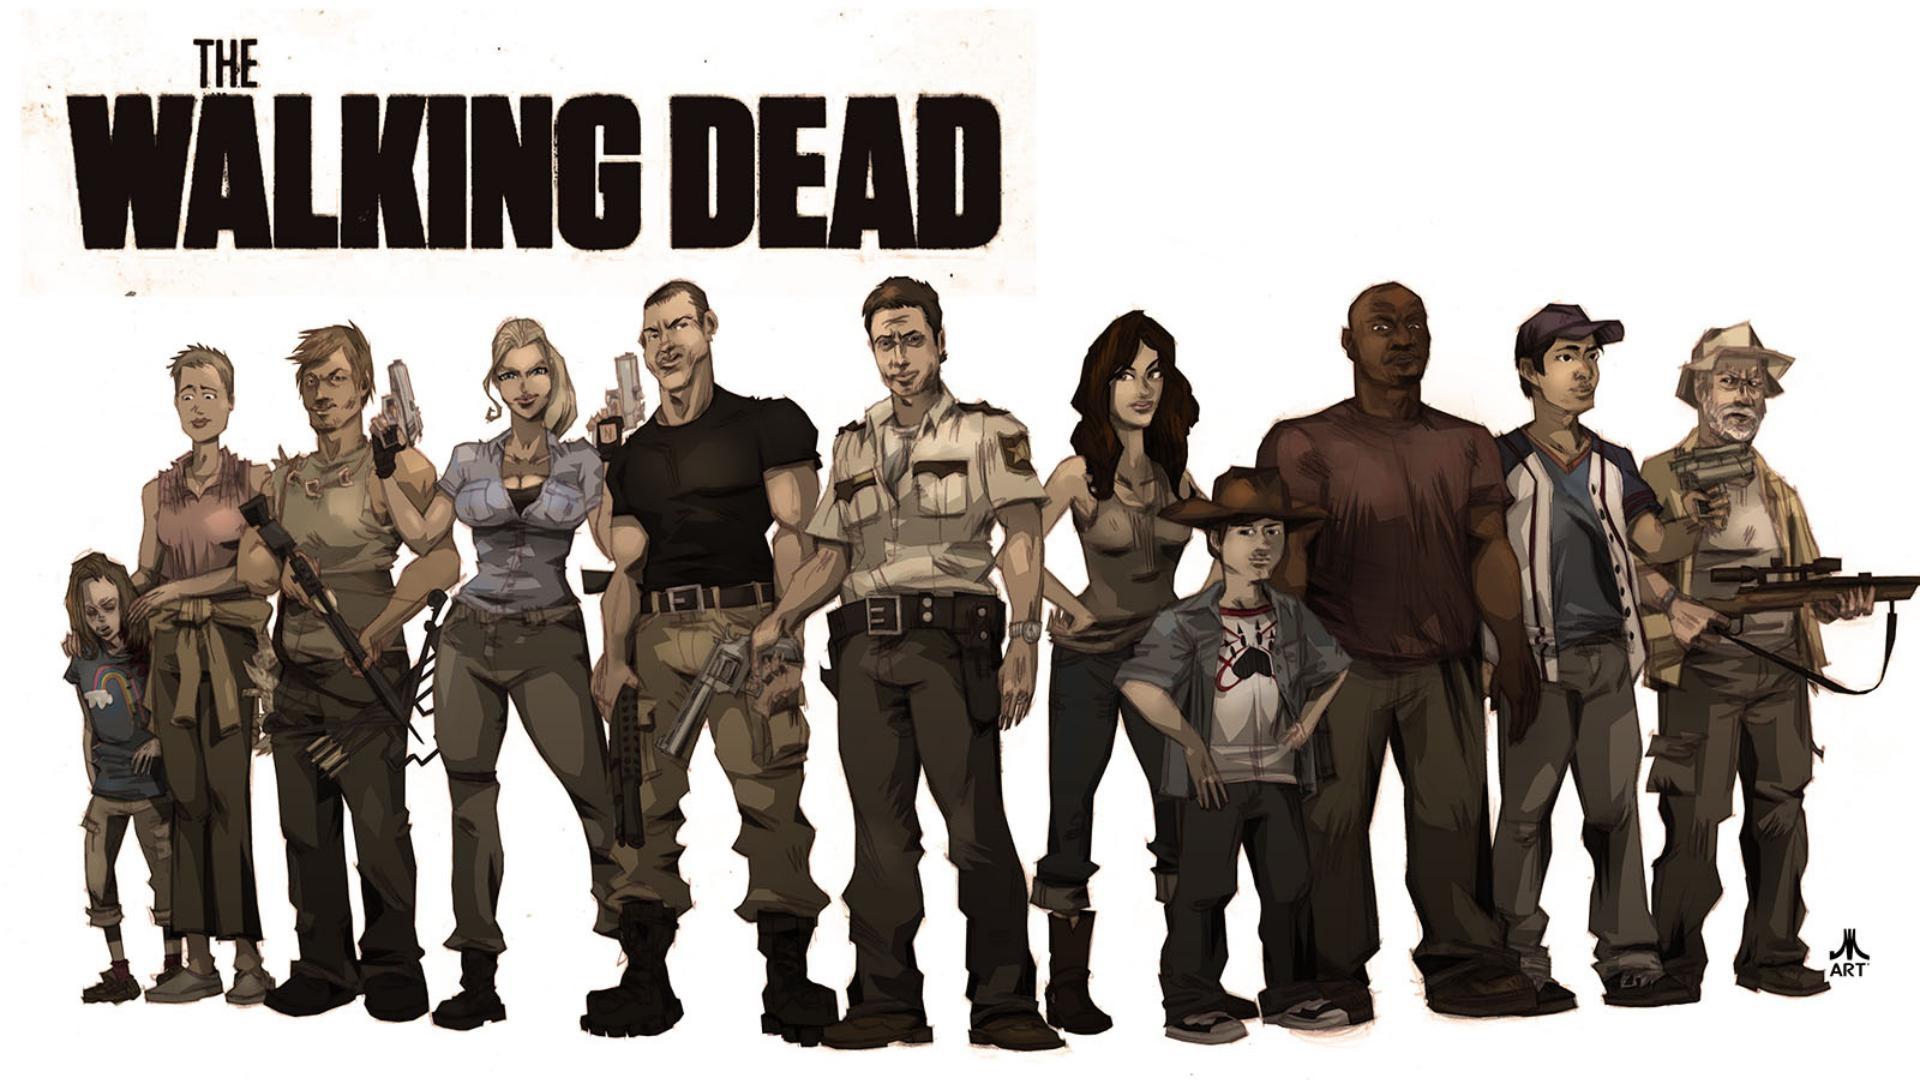 50 The Walking Dead Animated Wallpaper On Wallpapersafari